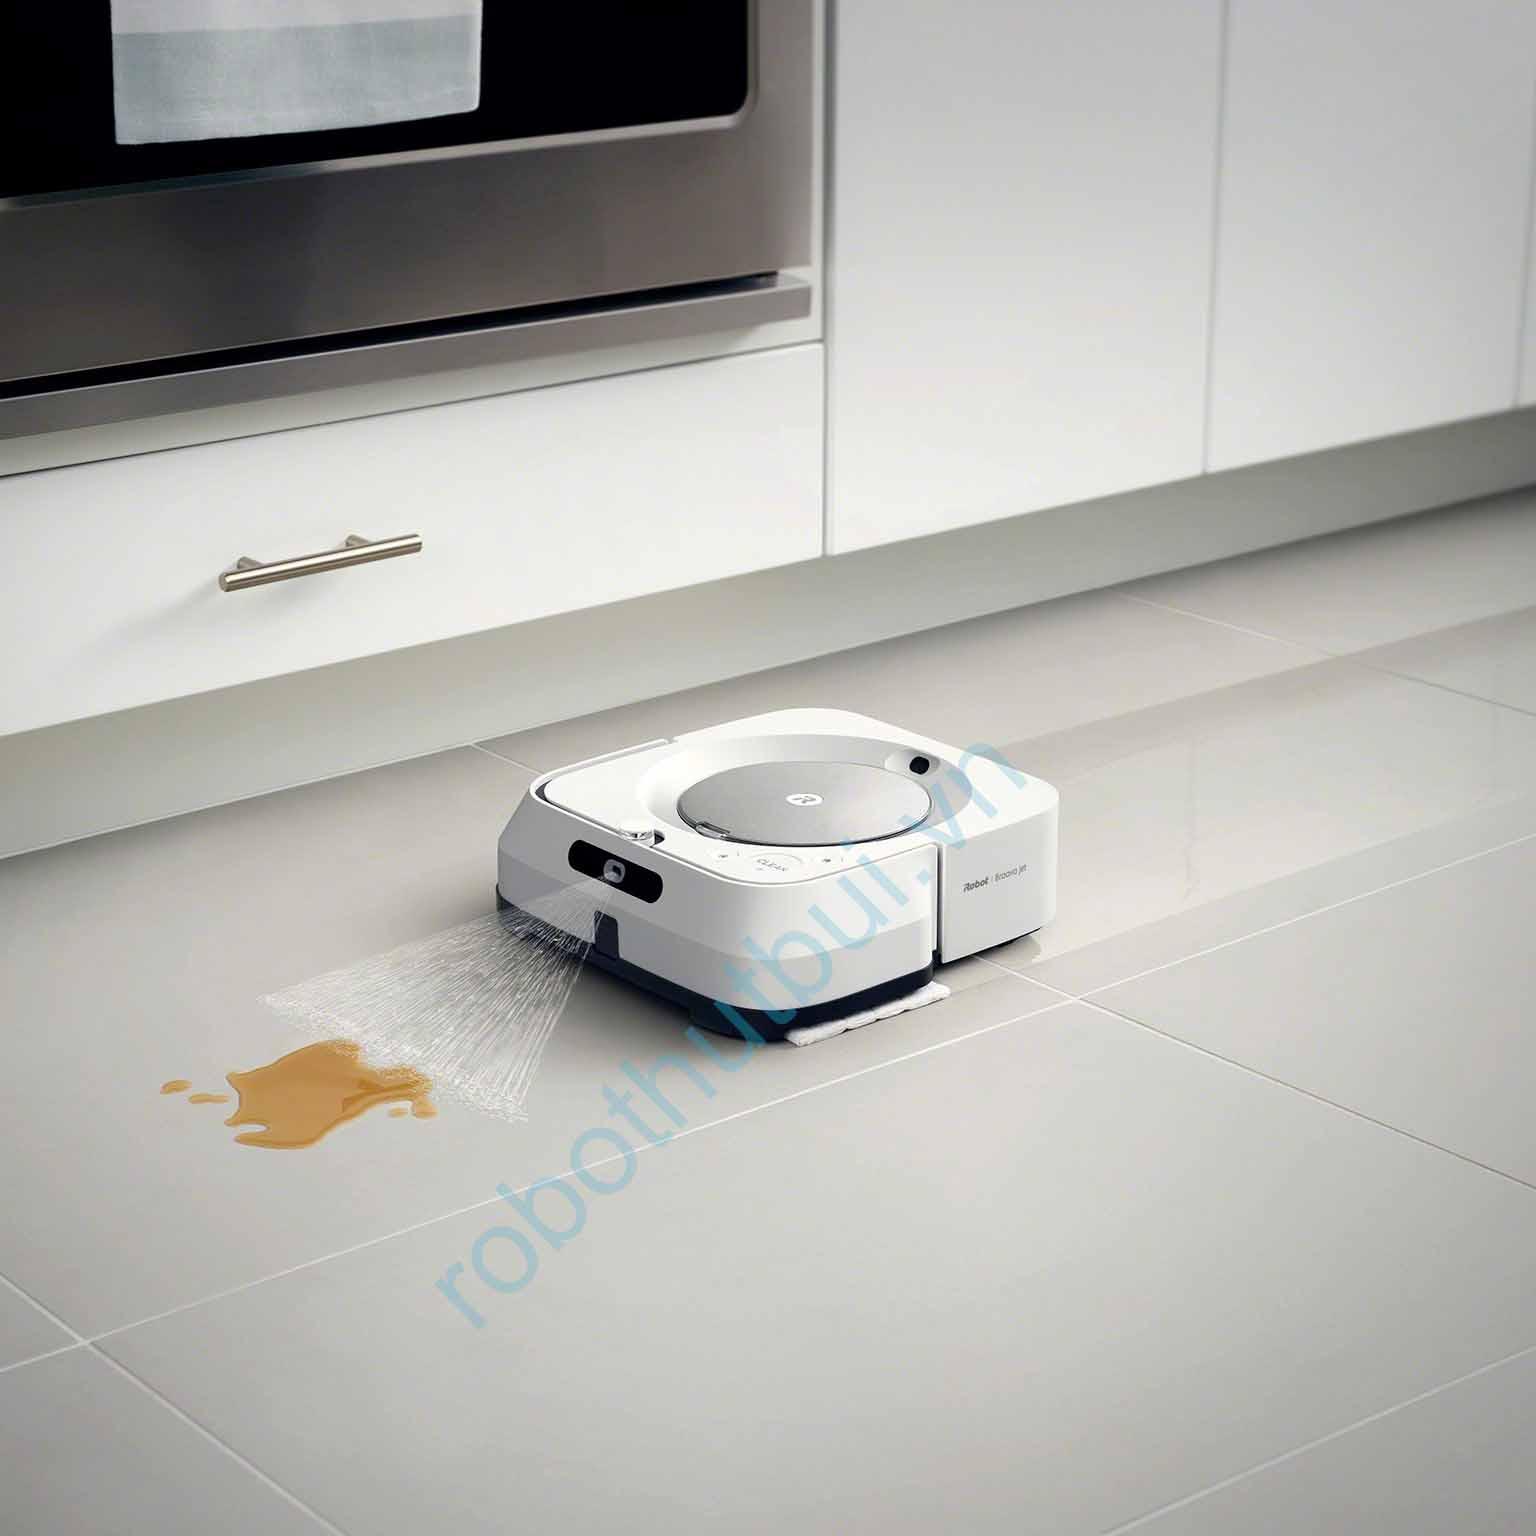 iRobot Braava jet m6 Robot lau nhà